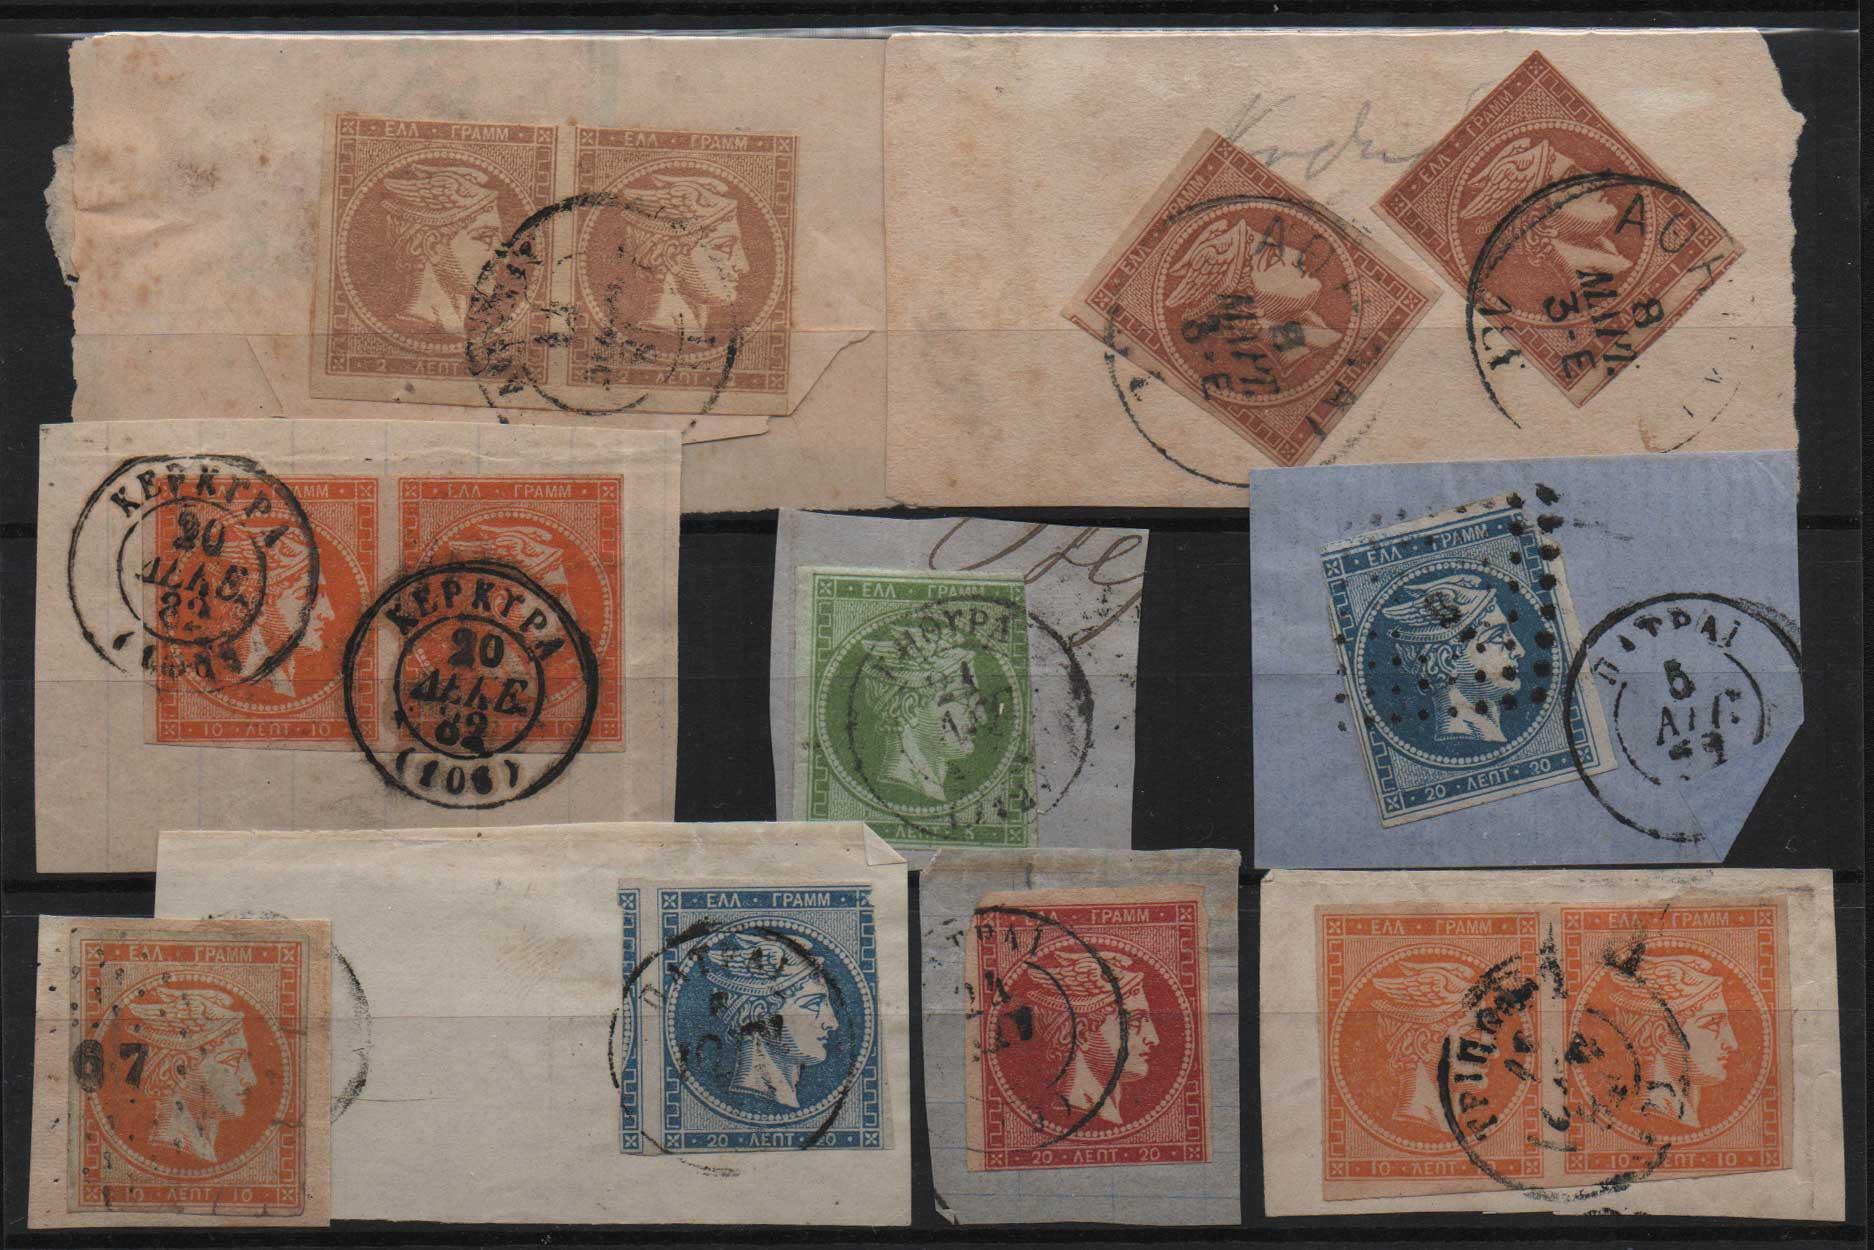 Lot 22 - large hermes head large hermes head -  Athens Auctions Public Auction 72 General Stamp Sale